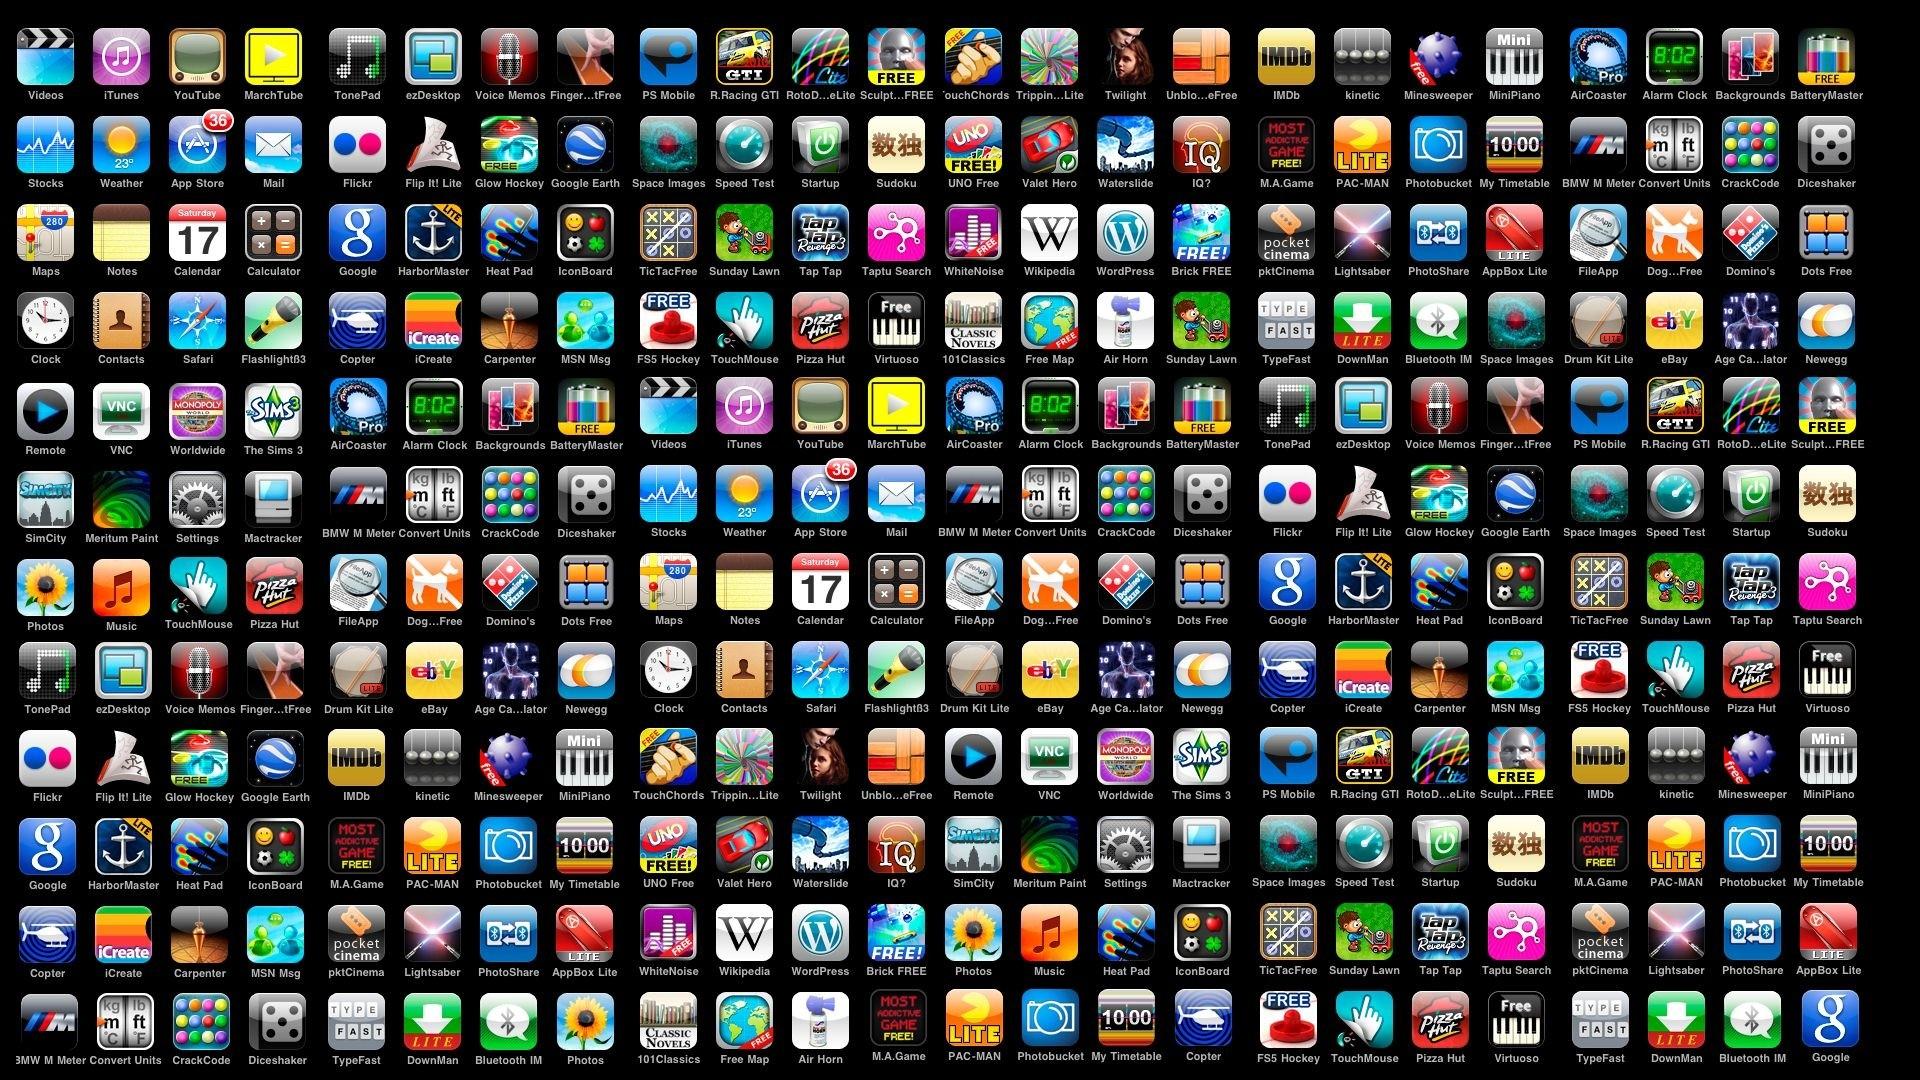 … Live Wallpaper Apps Free Live Wallpaper Apps